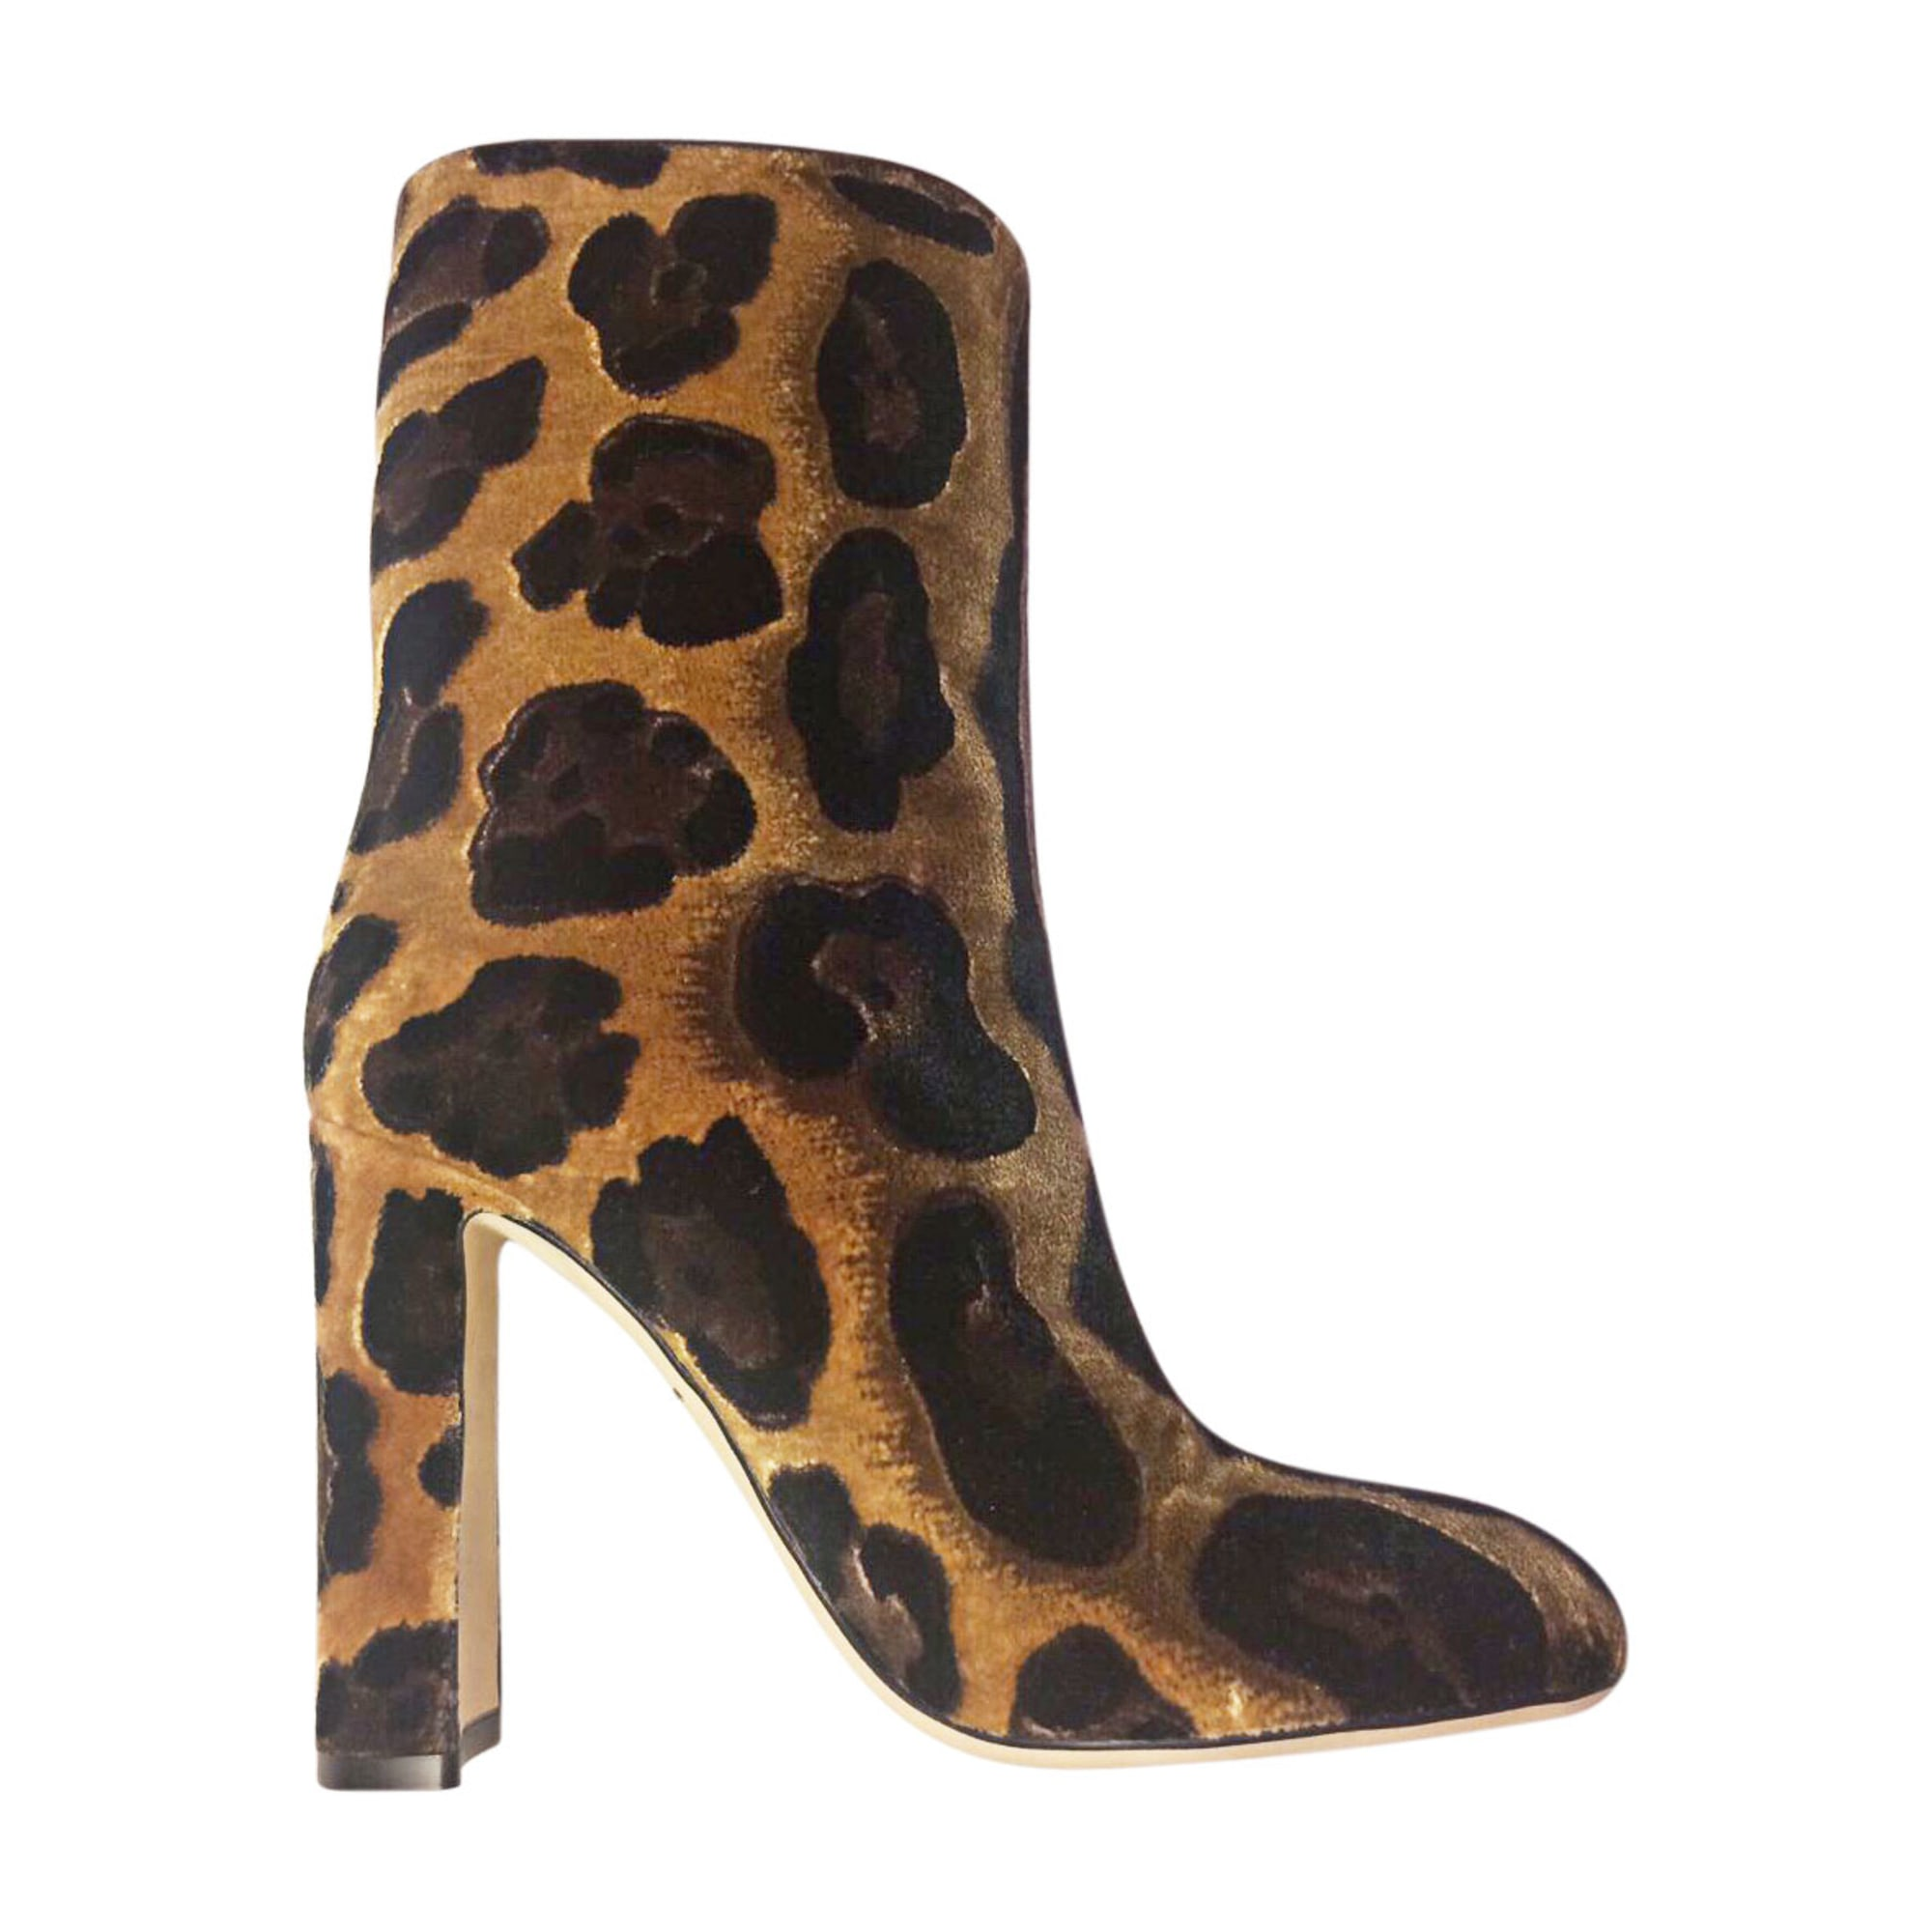 High Heel Ankle Boots DOLCE & GABBANA Animal prints